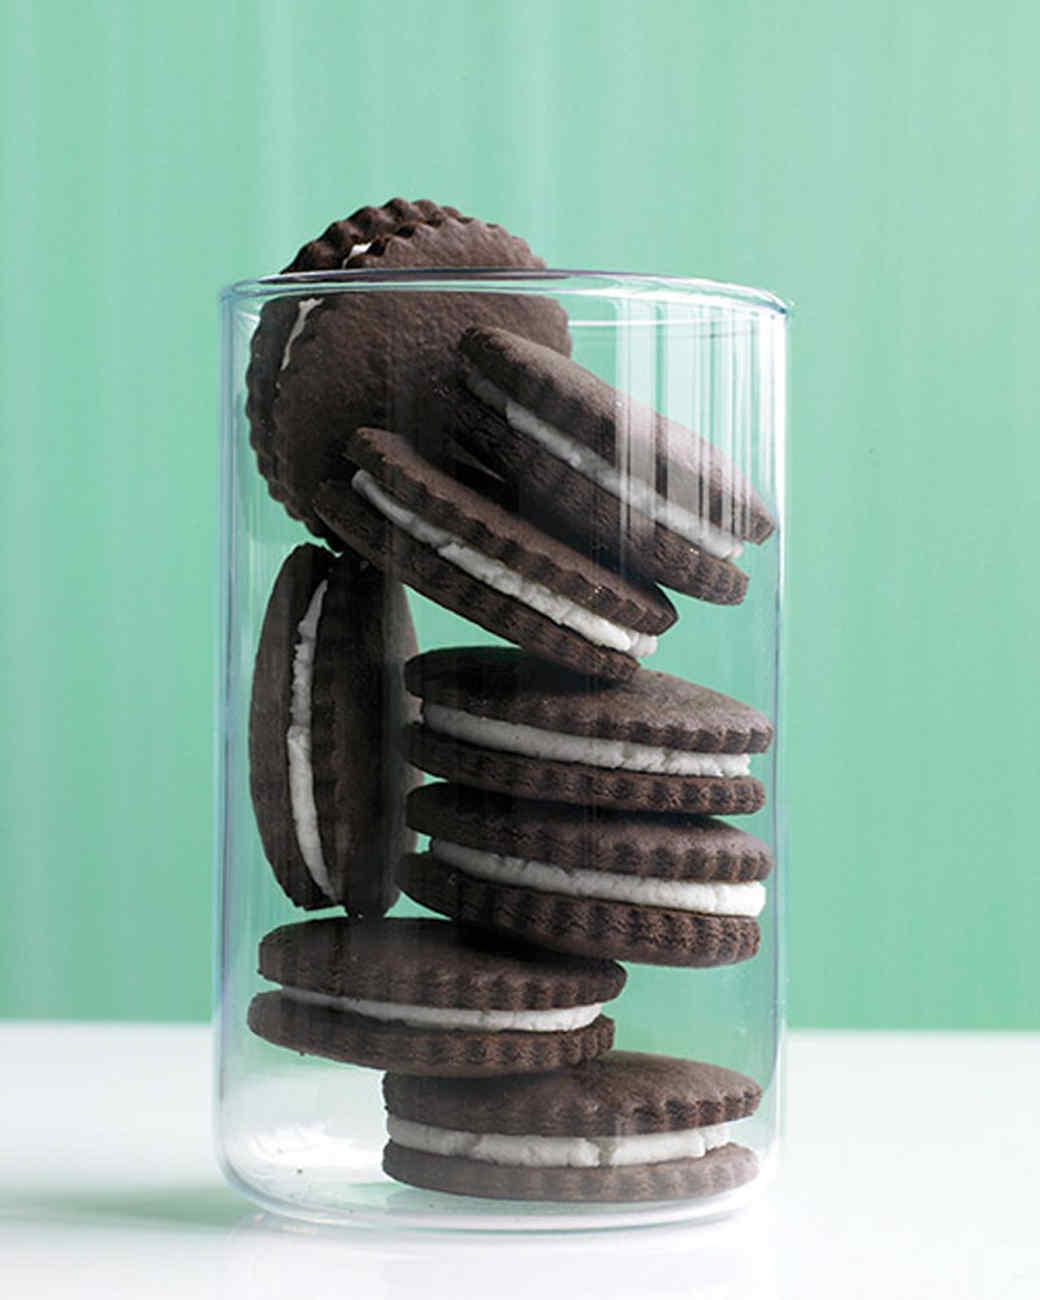 Chocolate 'n' Cream Sandwich Cookies